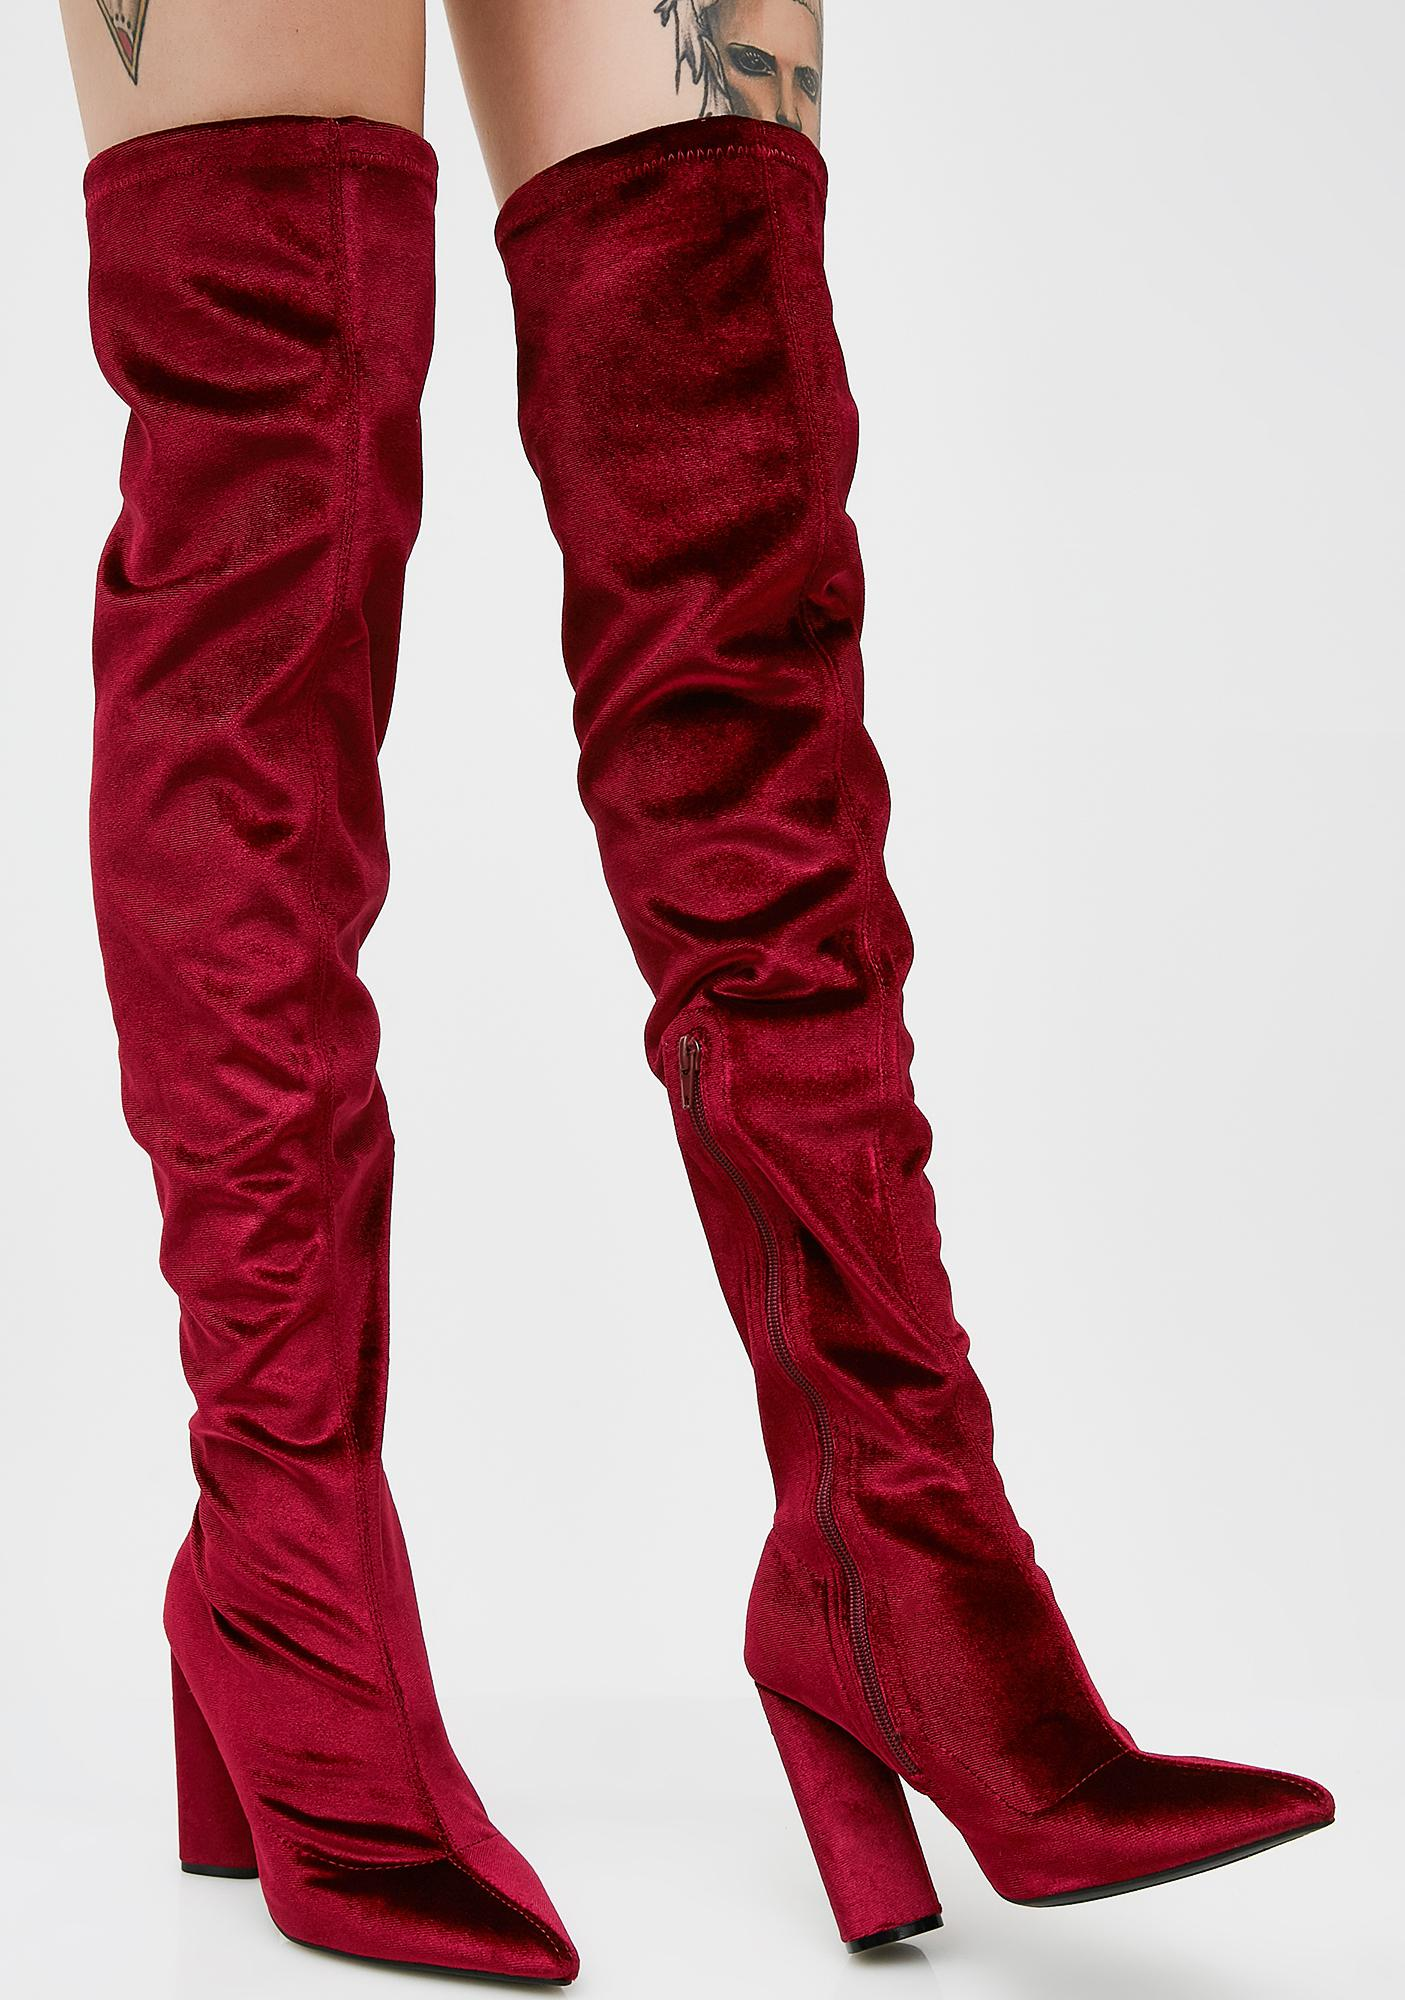 Wine Burnin' Romance Over The Knee Boots